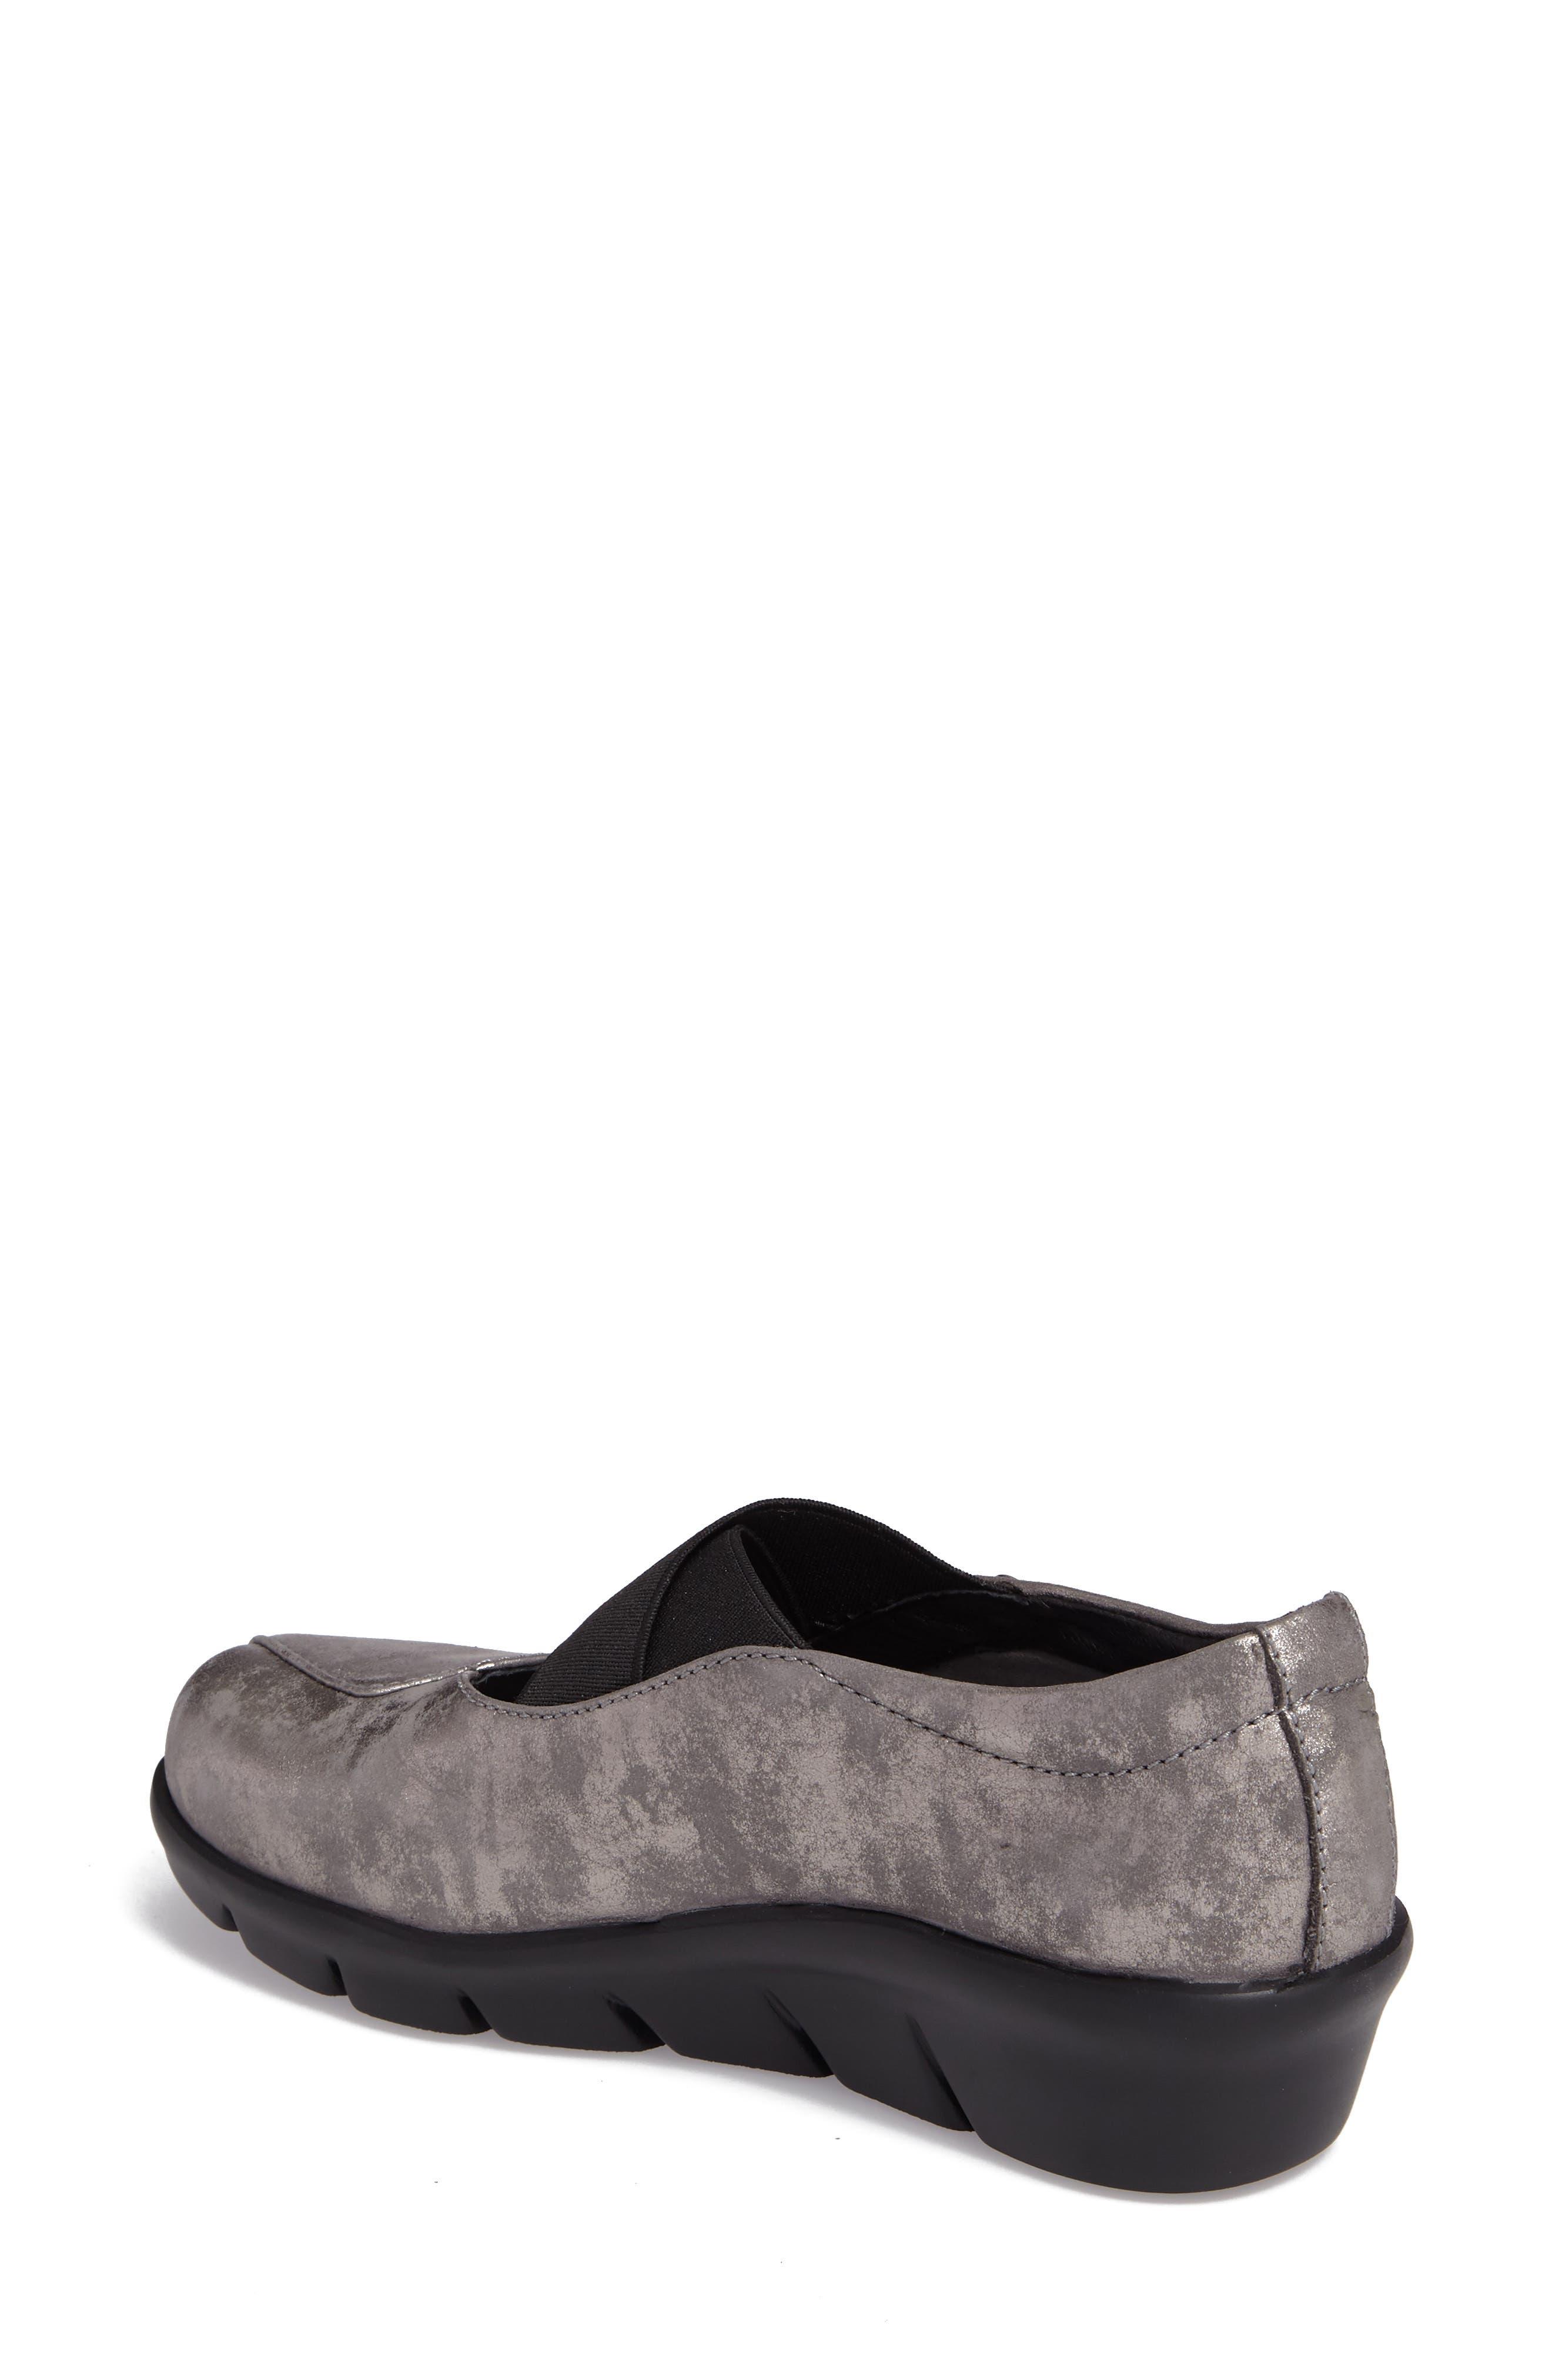 Alternate Image 2  - Wolky Cursa Slip-On Sneaker (Women)